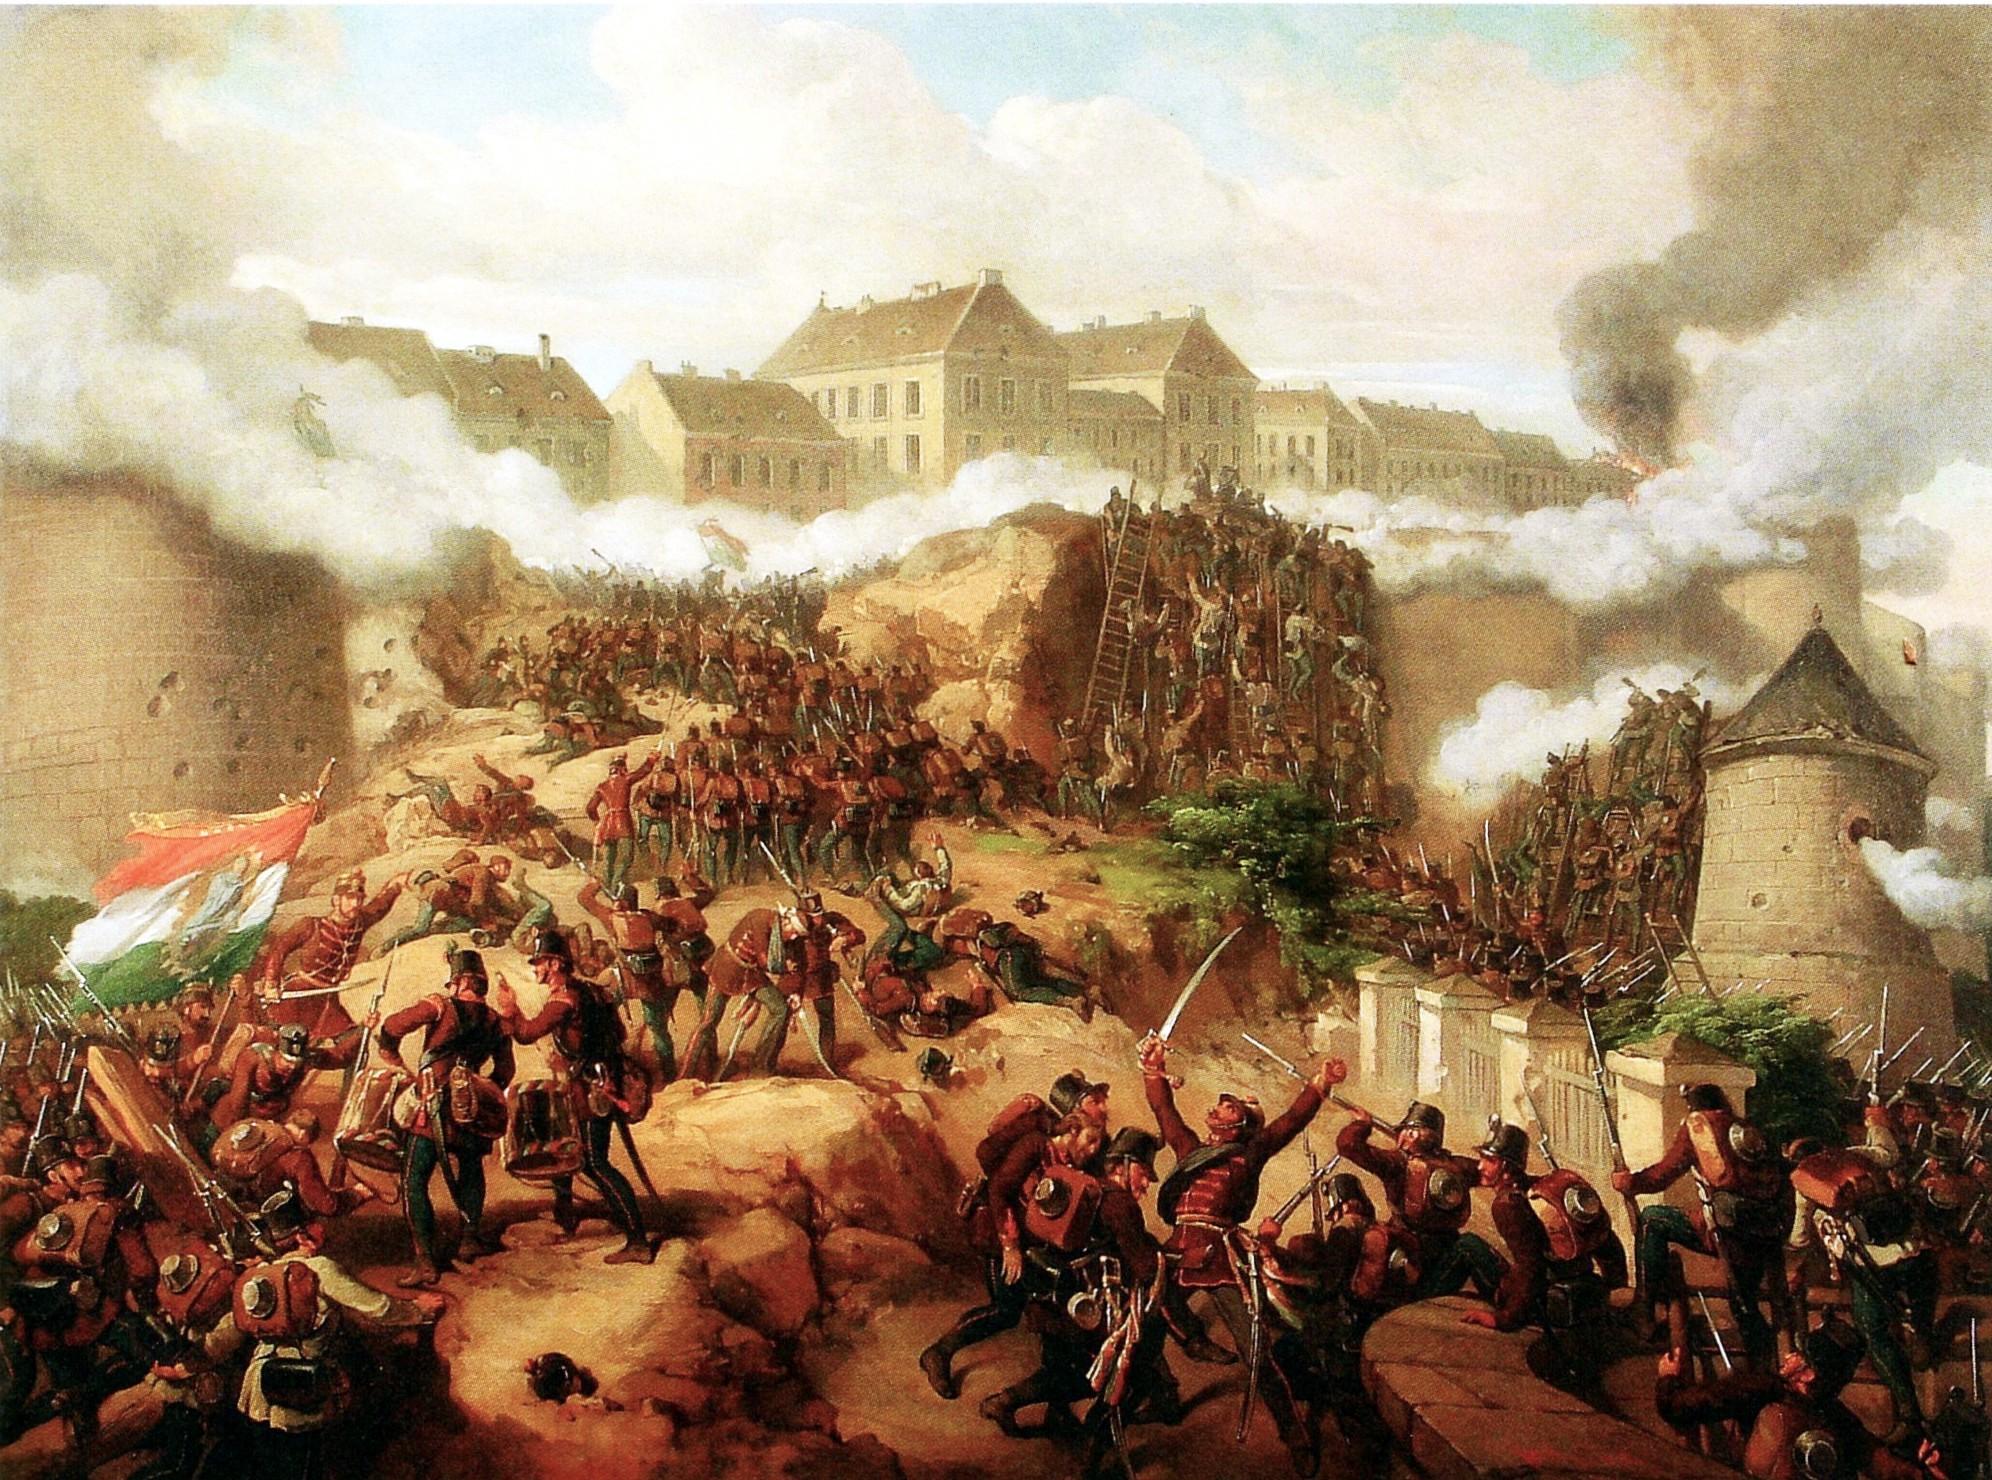 A study on revolutions